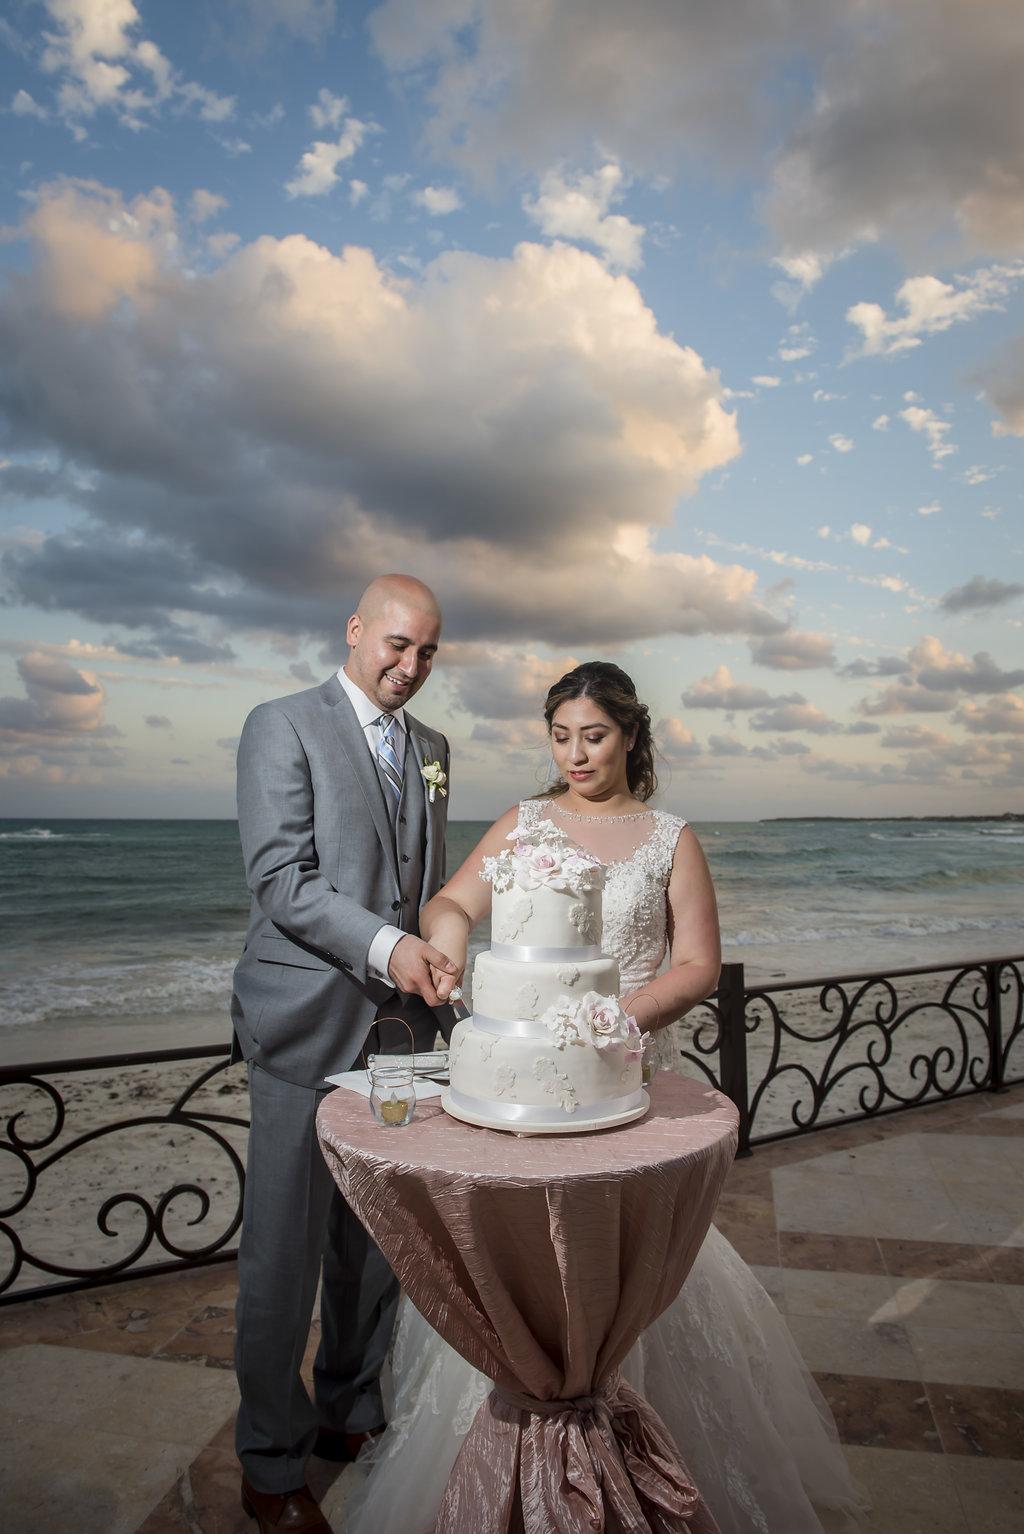 yesica-jose-beach-wedding-Villa-La-Joya--Playa-del-carmen-01--34.jpg